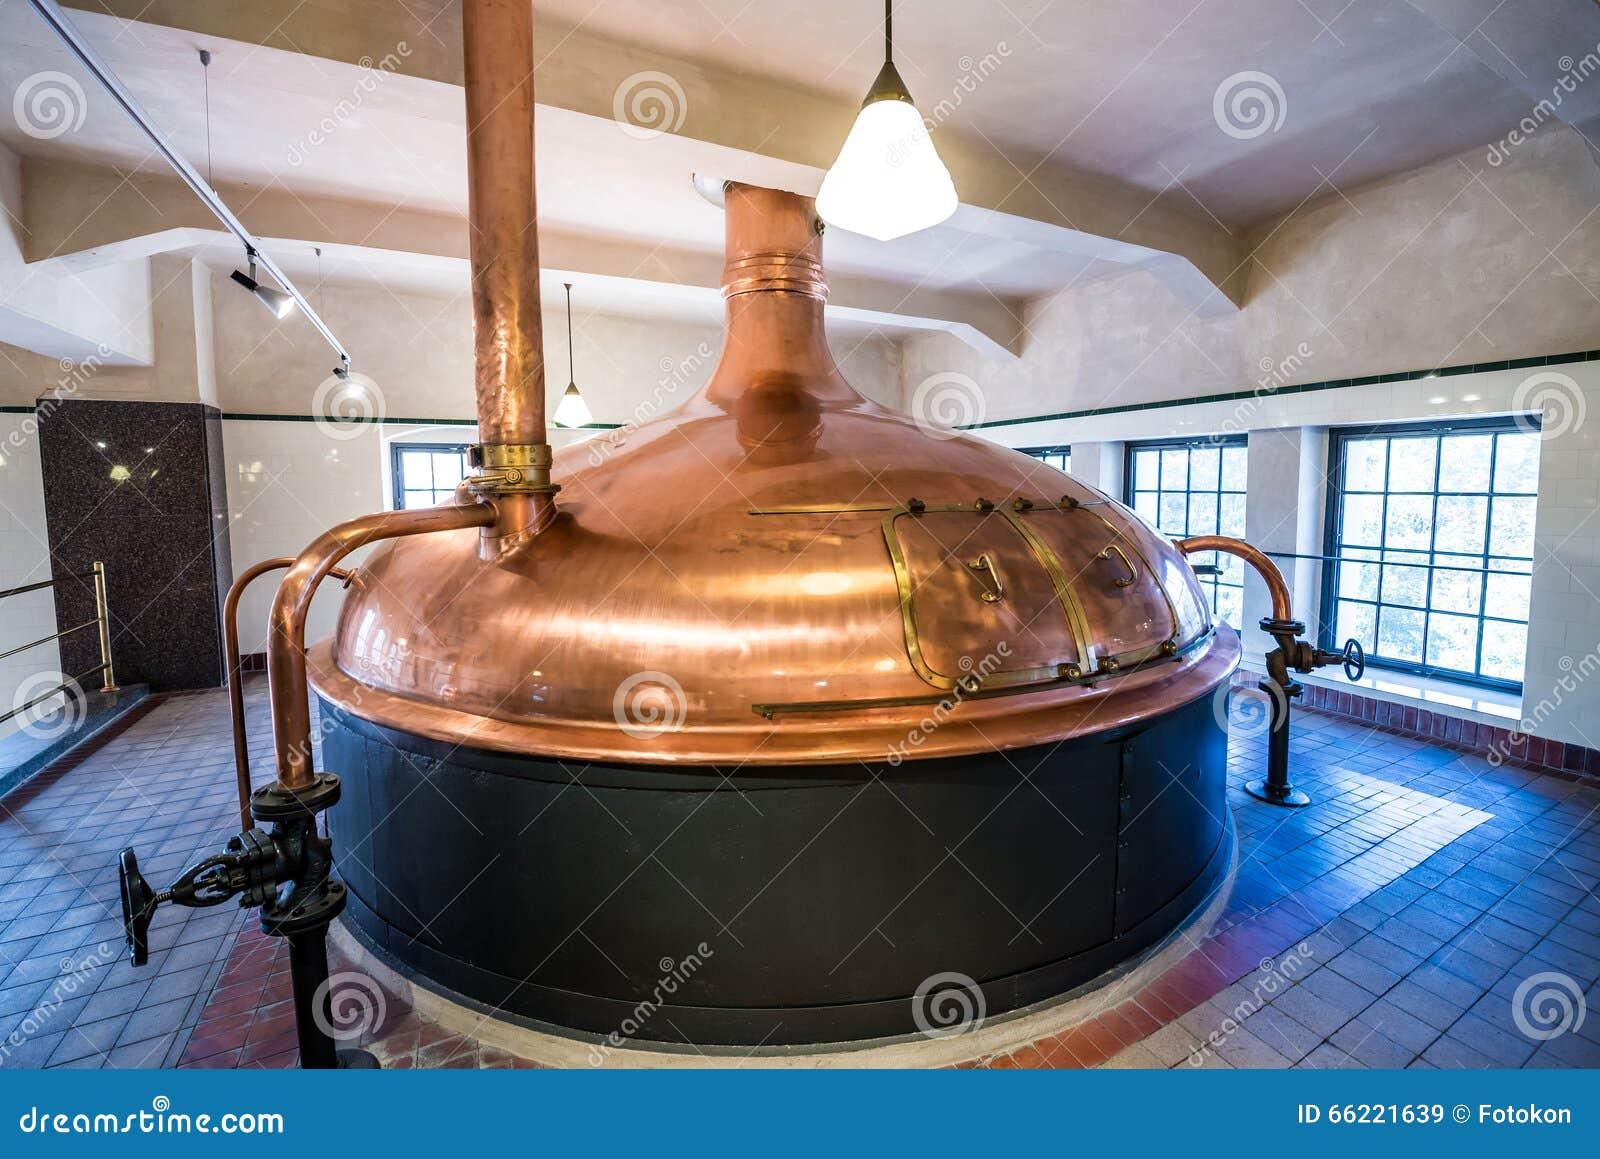 El sector cervecero